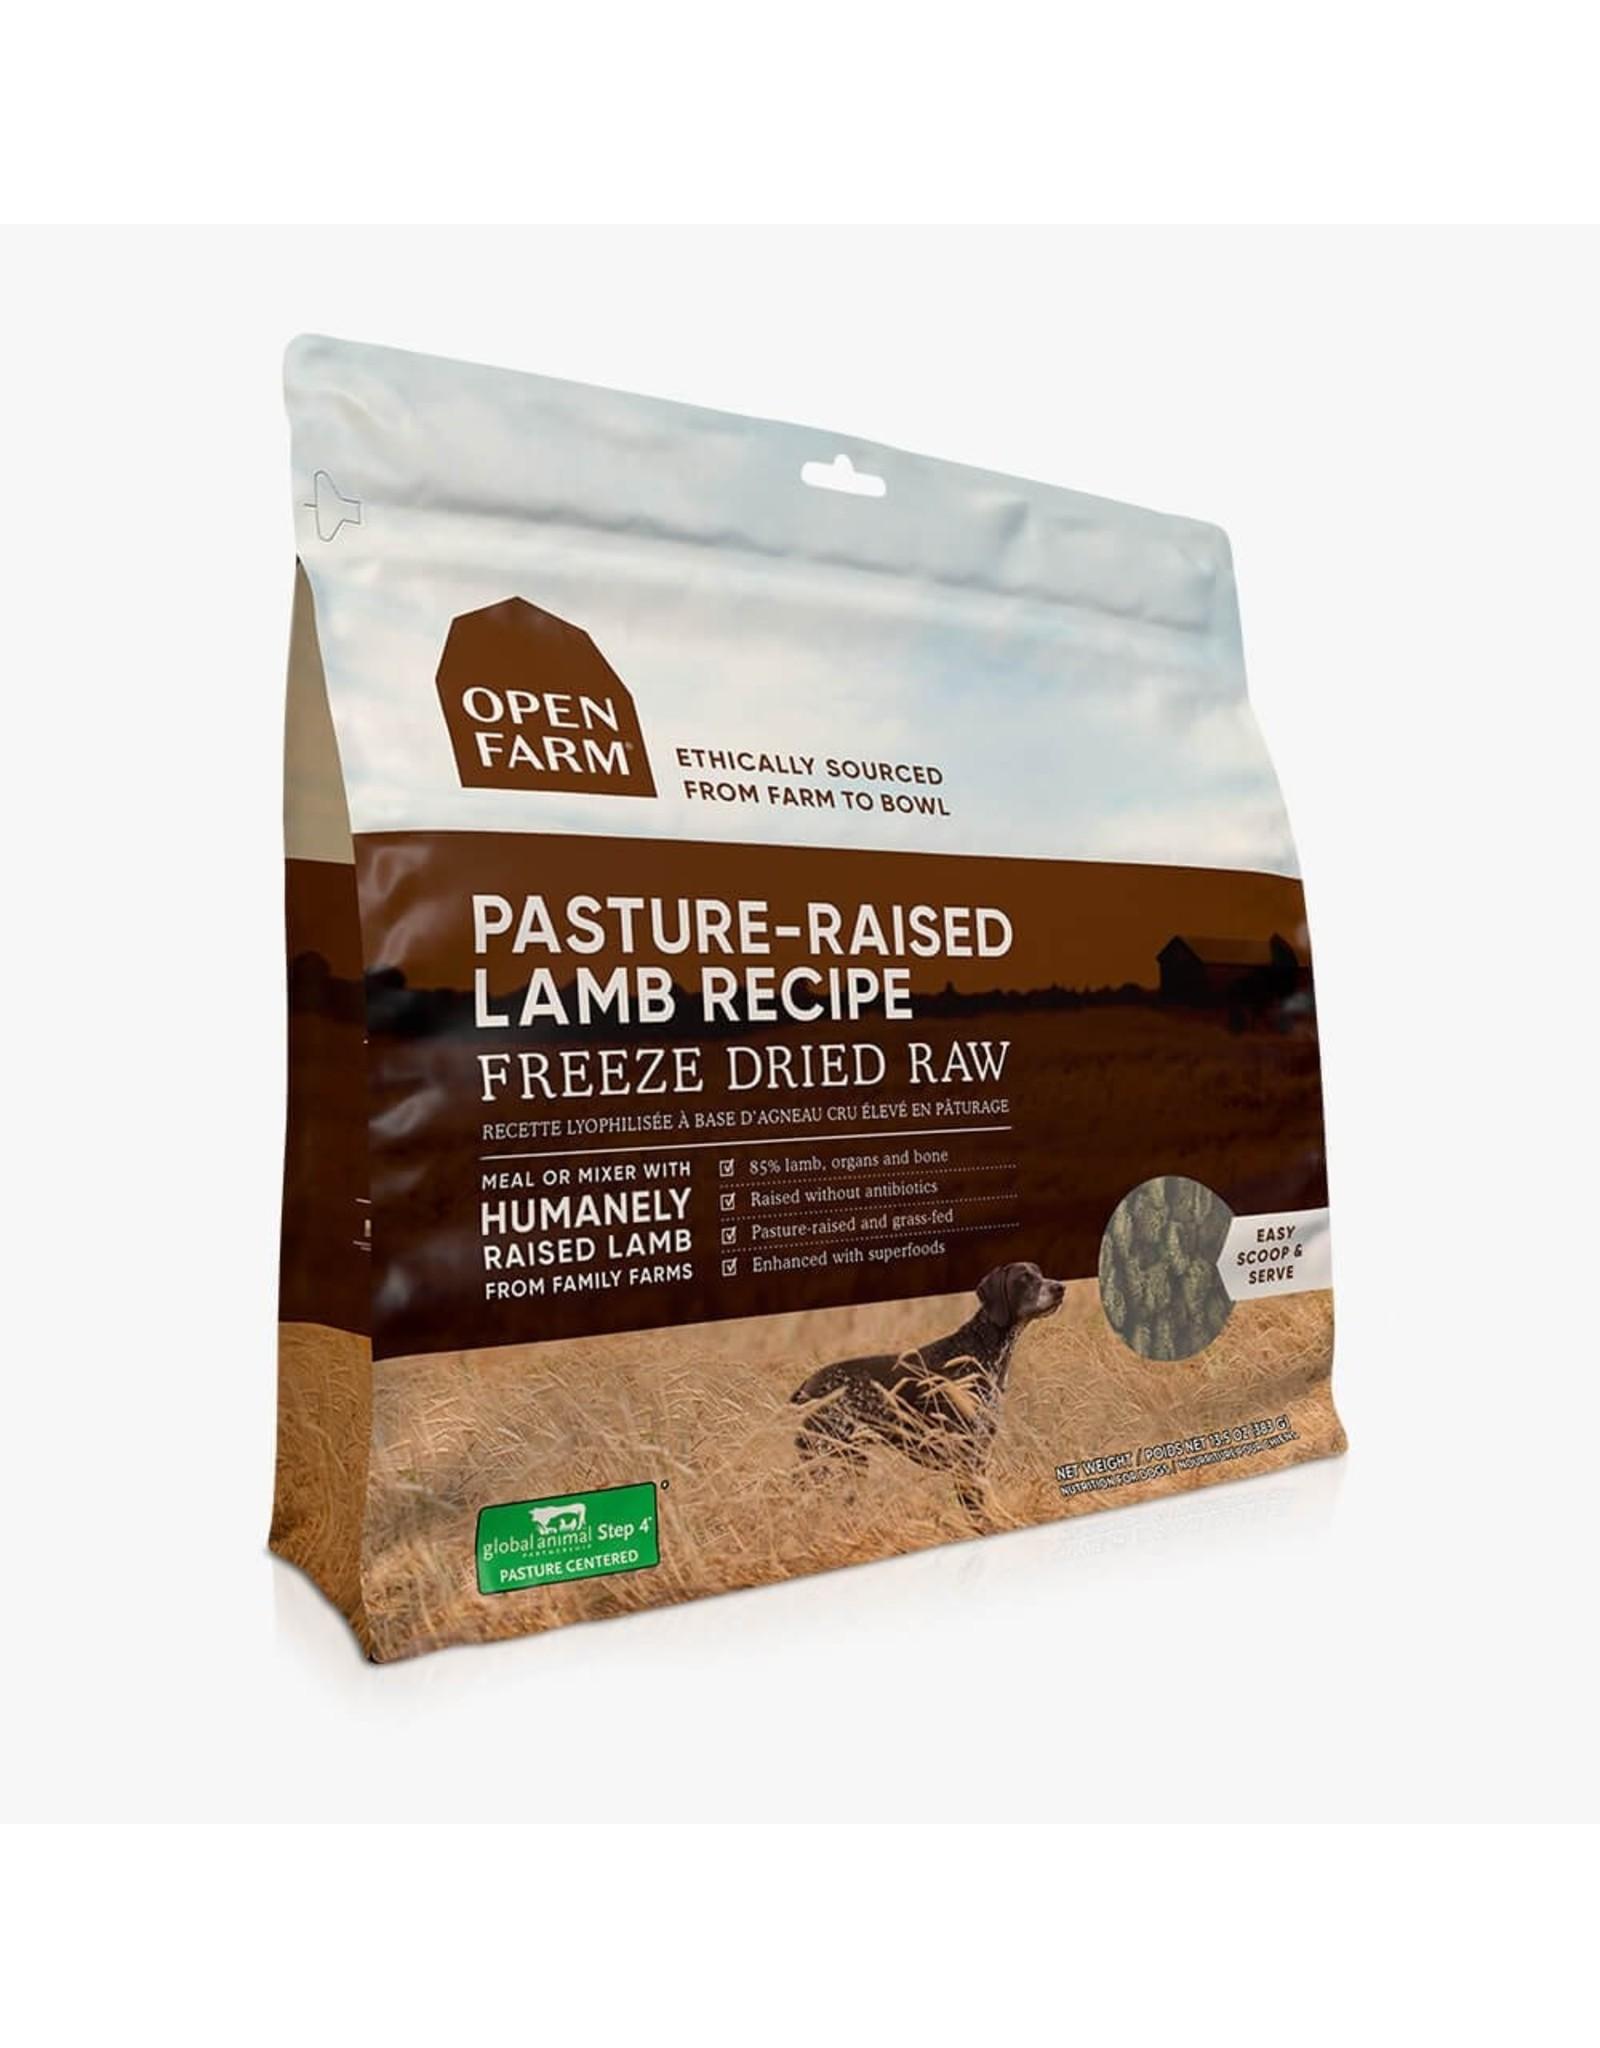 Open Farm OPEN FARM DOG FREEZE DRIED RAW PASTURE-RAISED LAMB RECIPE